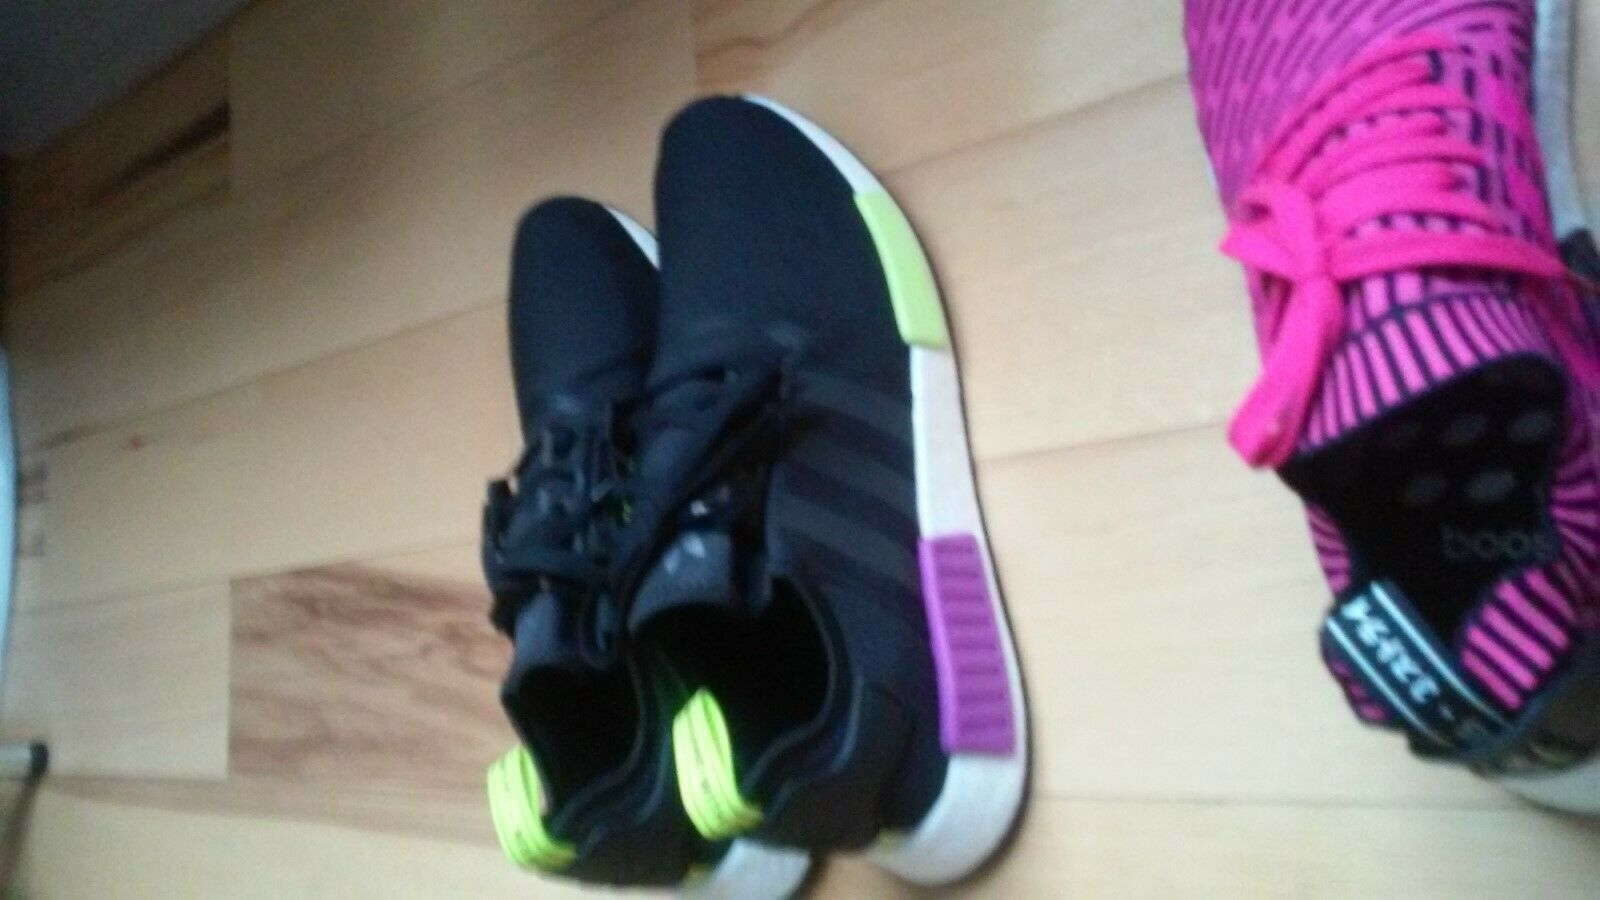 Adidas NMD R1 Men's size 14 Black purple c04cdgyhr41849 shoes